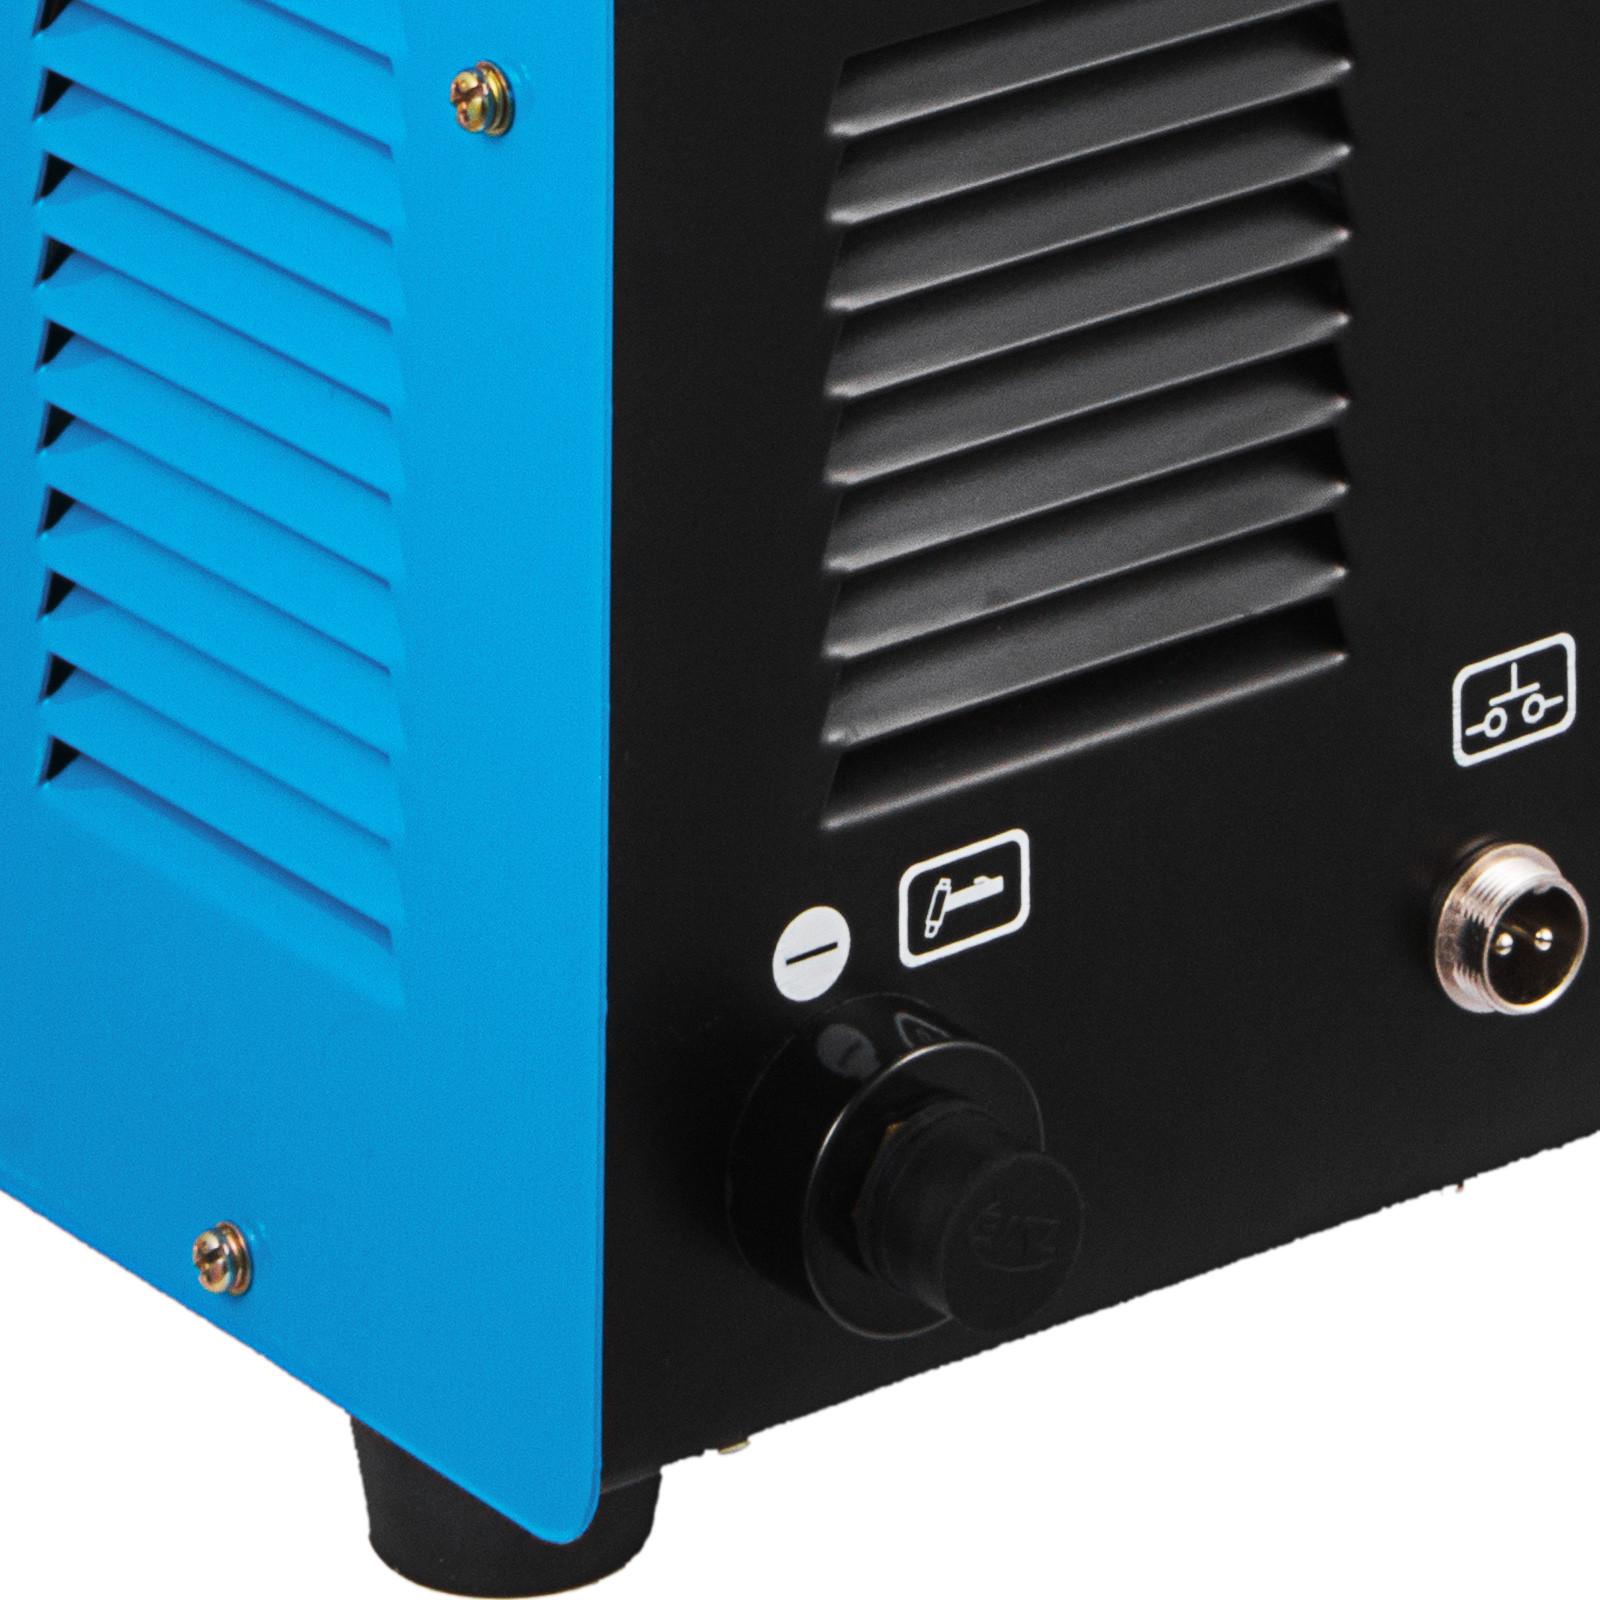 40-85A-Plasma-Cutter-Built-In-Air-Compressor-Inverter-Cutting-Machine-Cut-35mm thumbnail 23